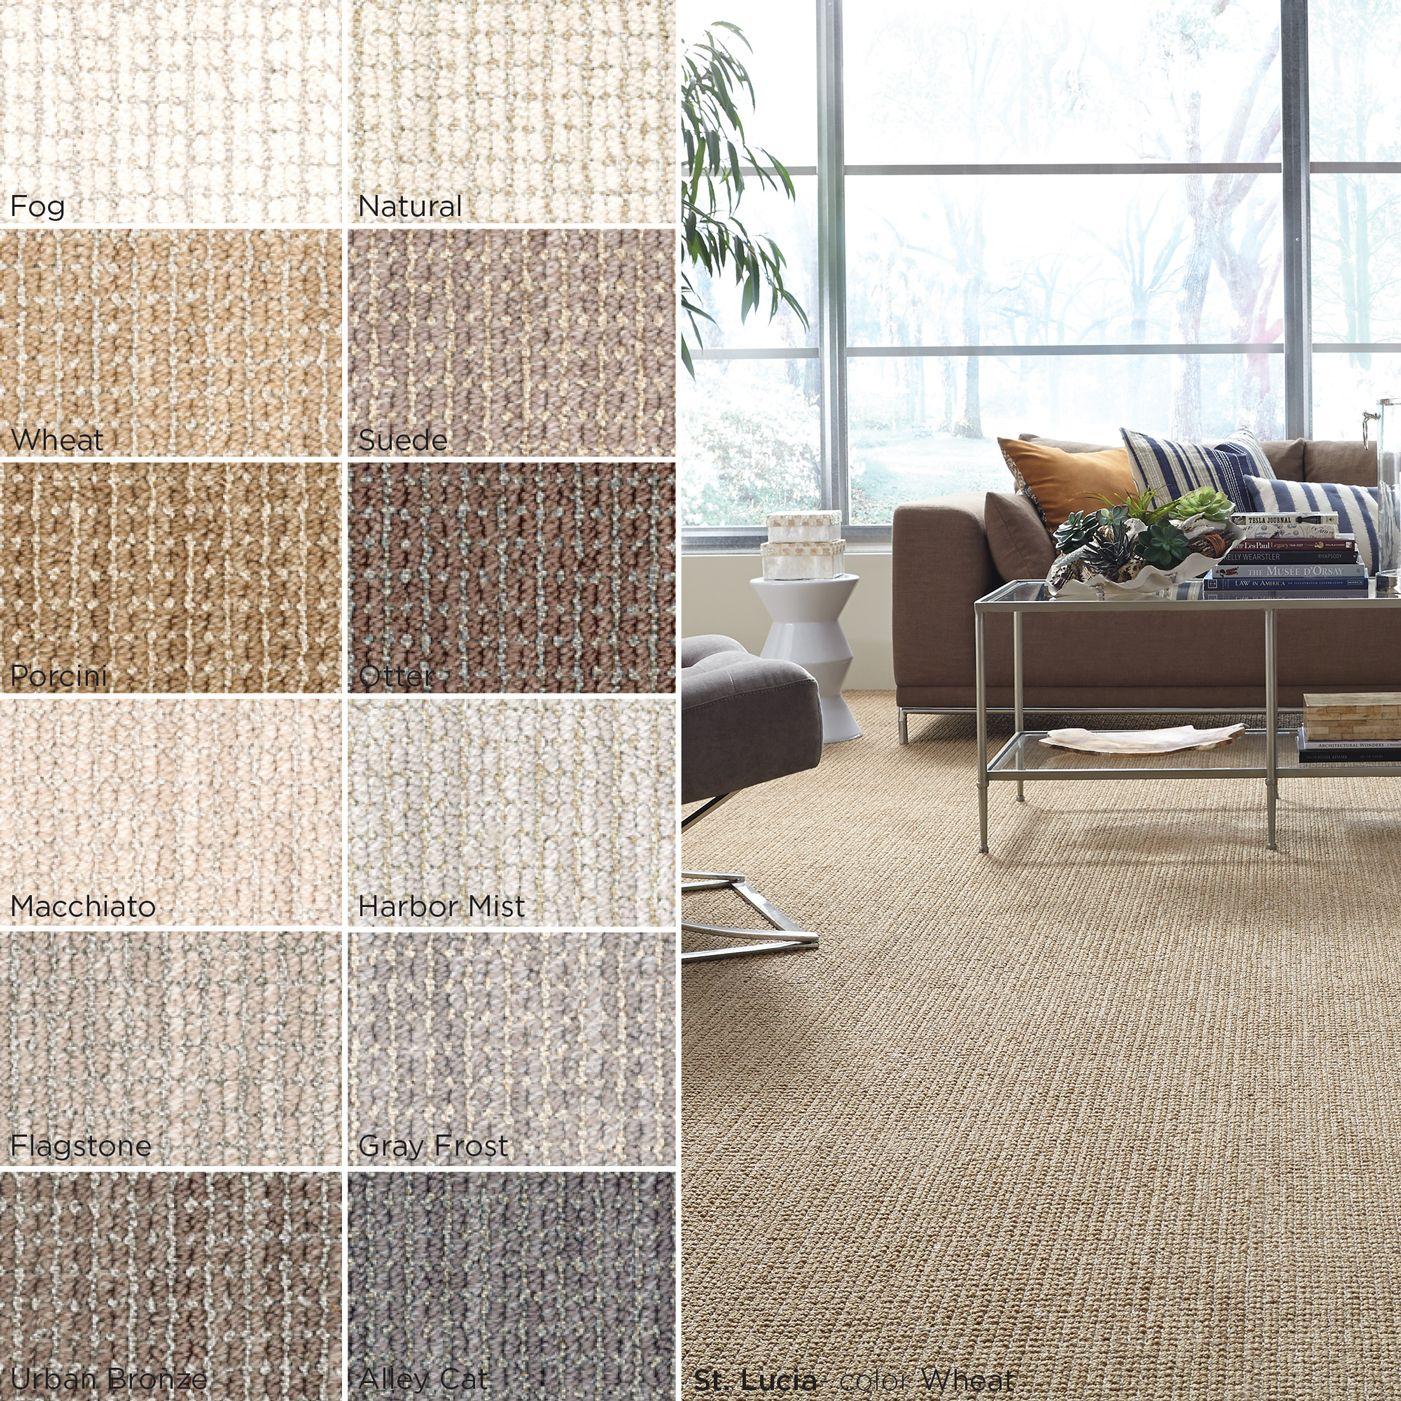 St Lucia Zz038 00214 Carpet Flooring Anderson Tuftex Carpet Staircase Carpet Flooring Home Carpet